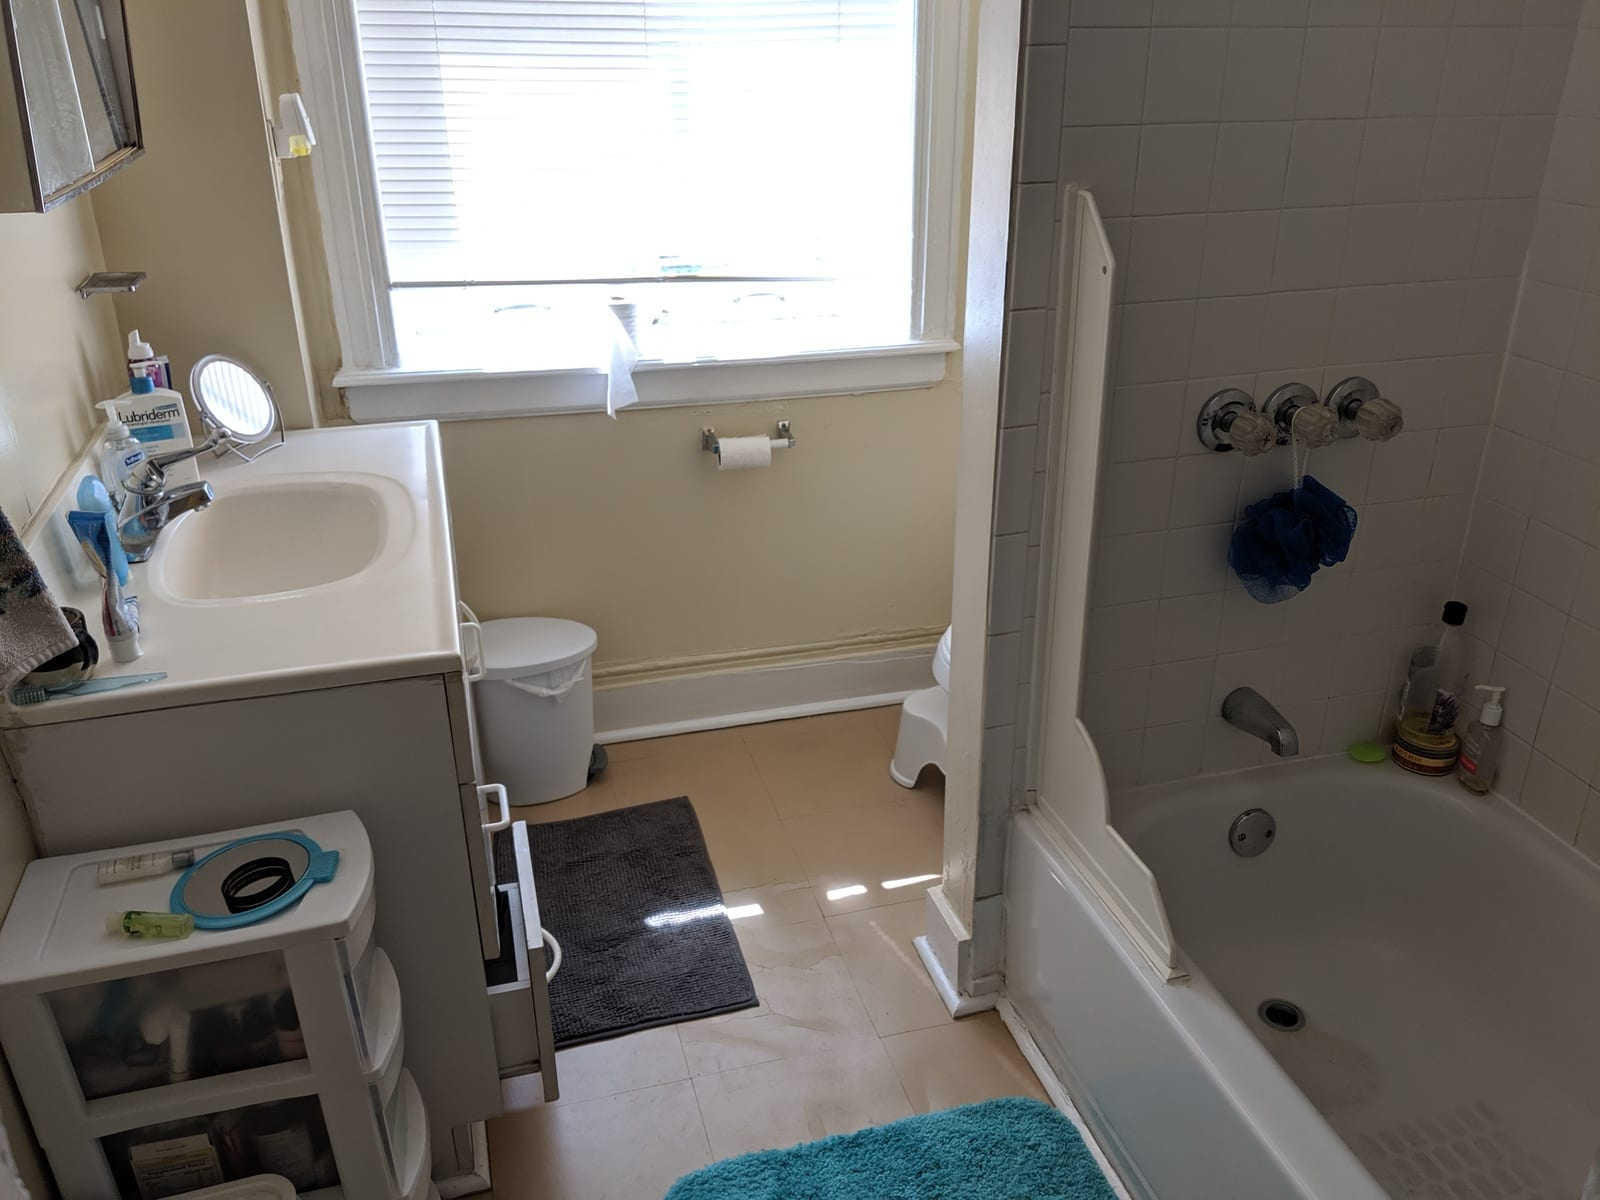 65 617 Paca 3 Bathroom